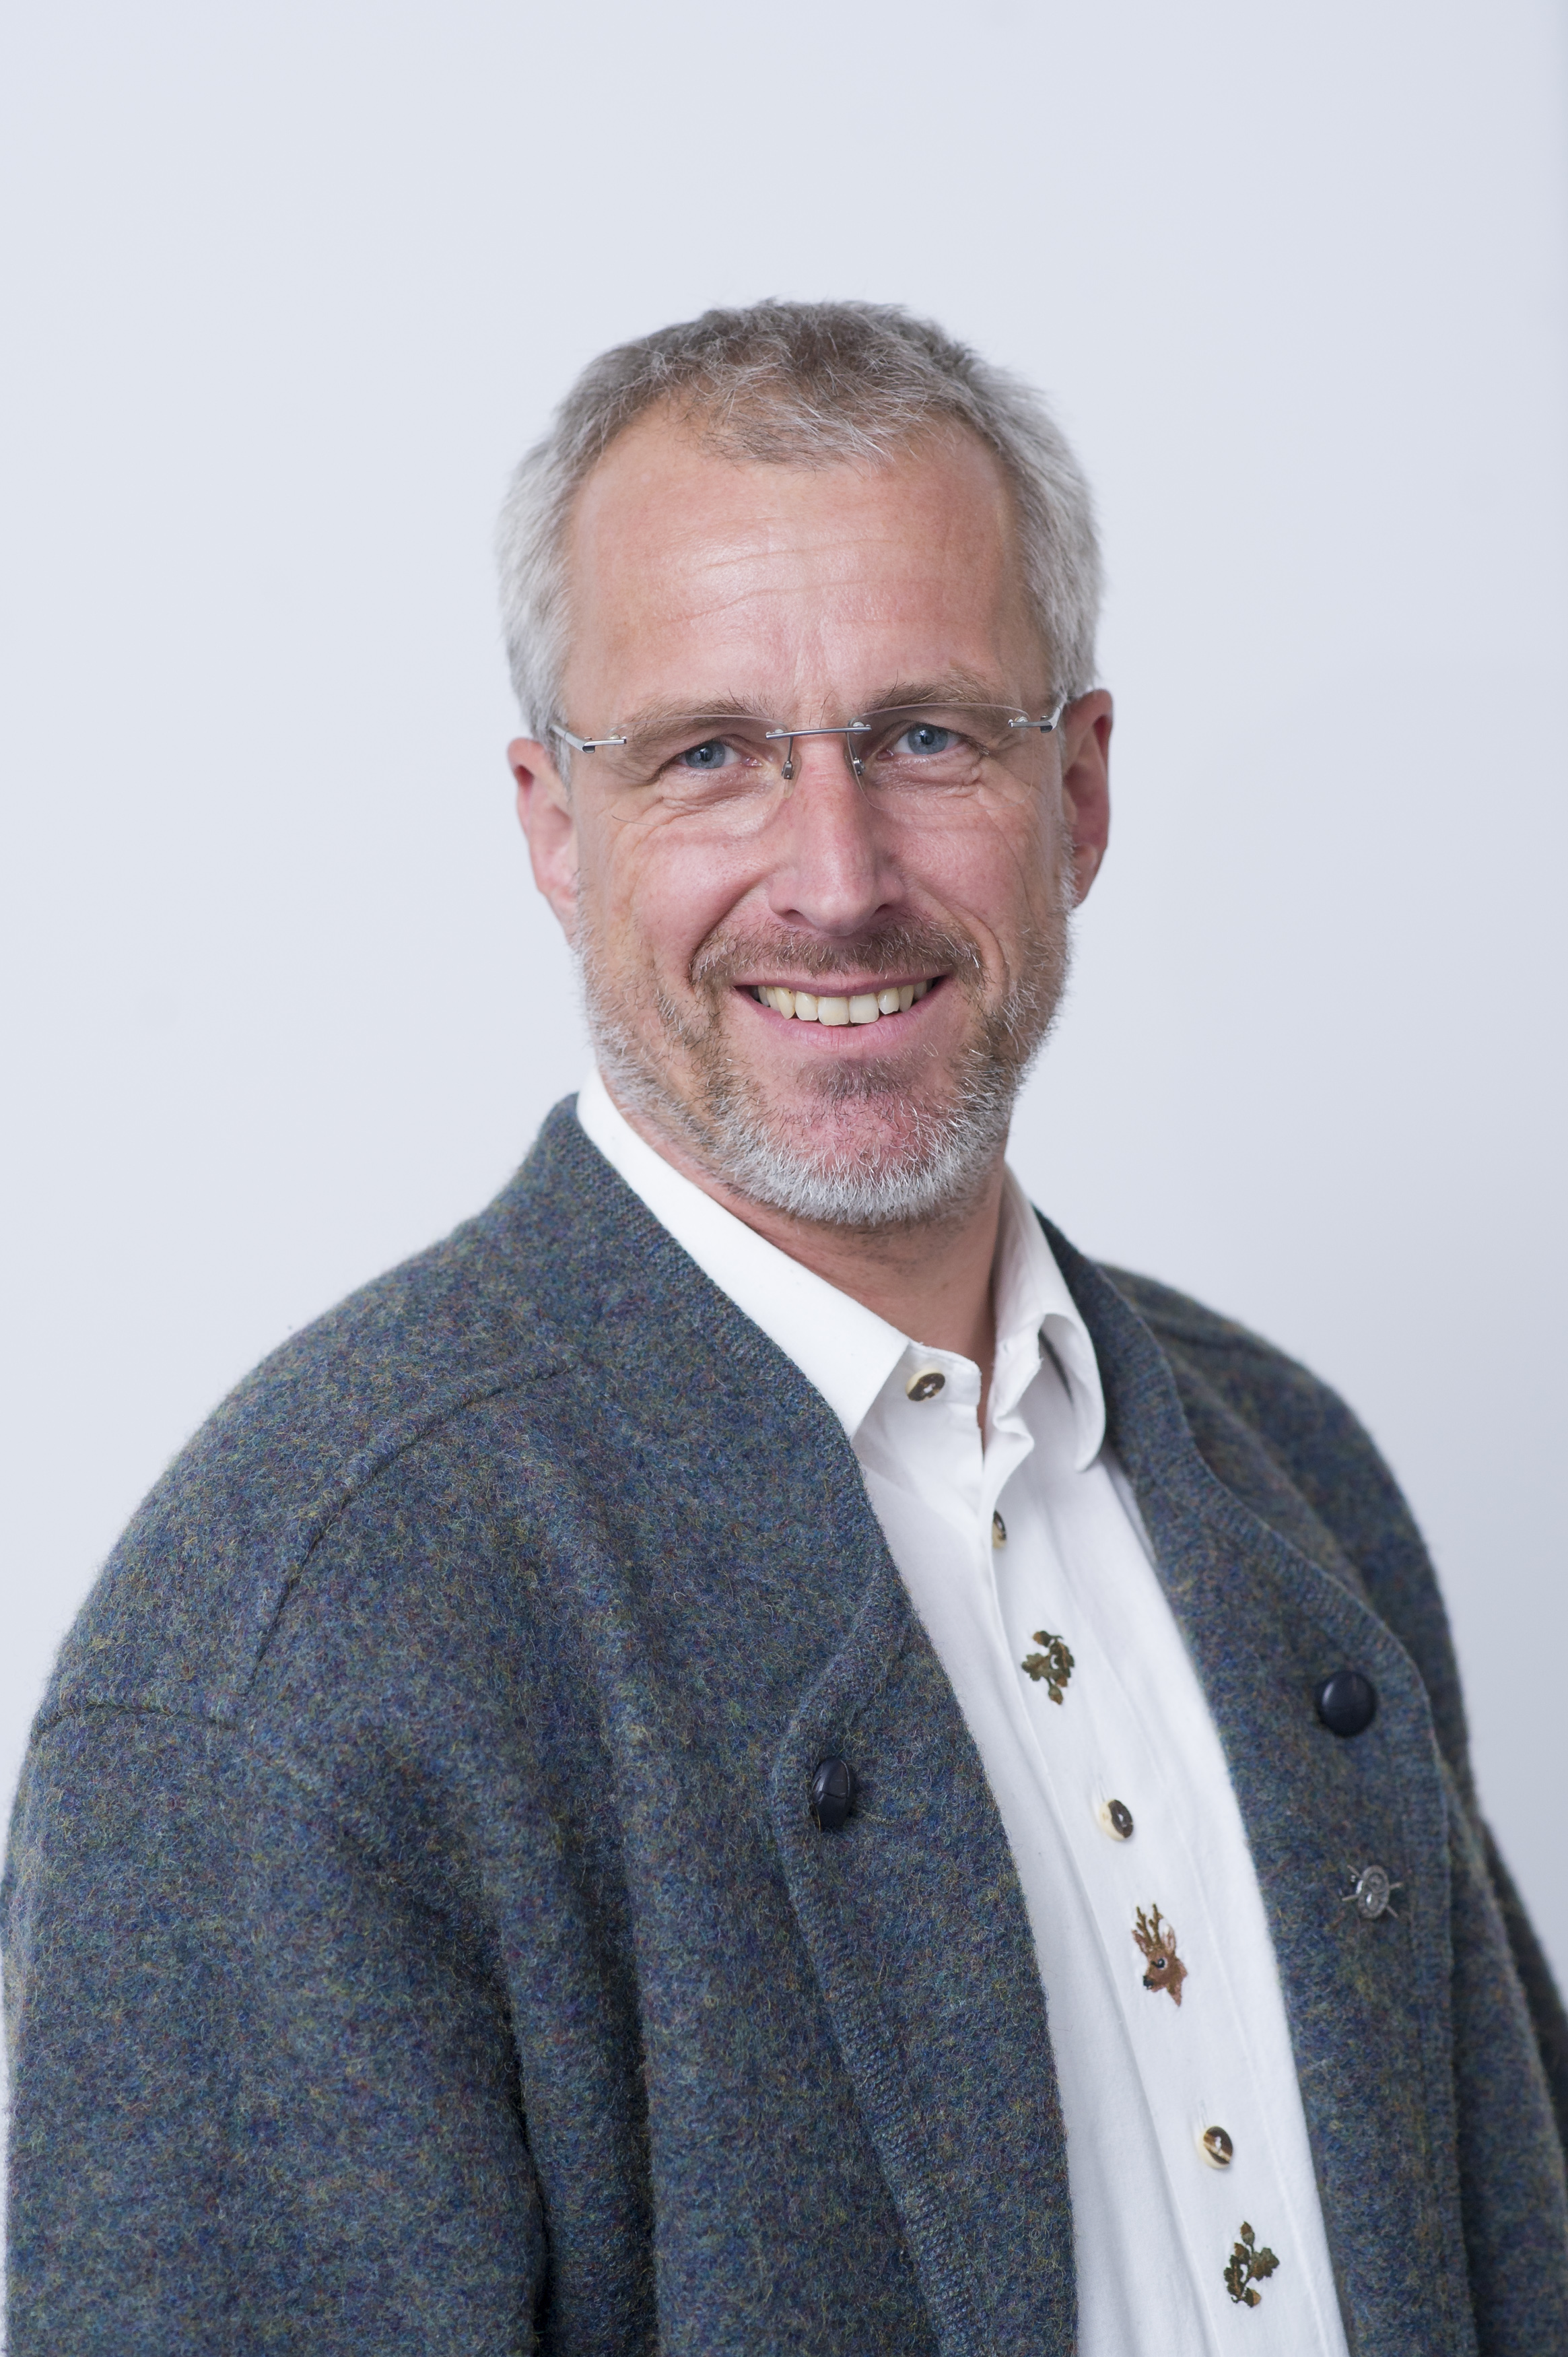 Holger Bartels, Präsident der Landesjägerschaft Bremen